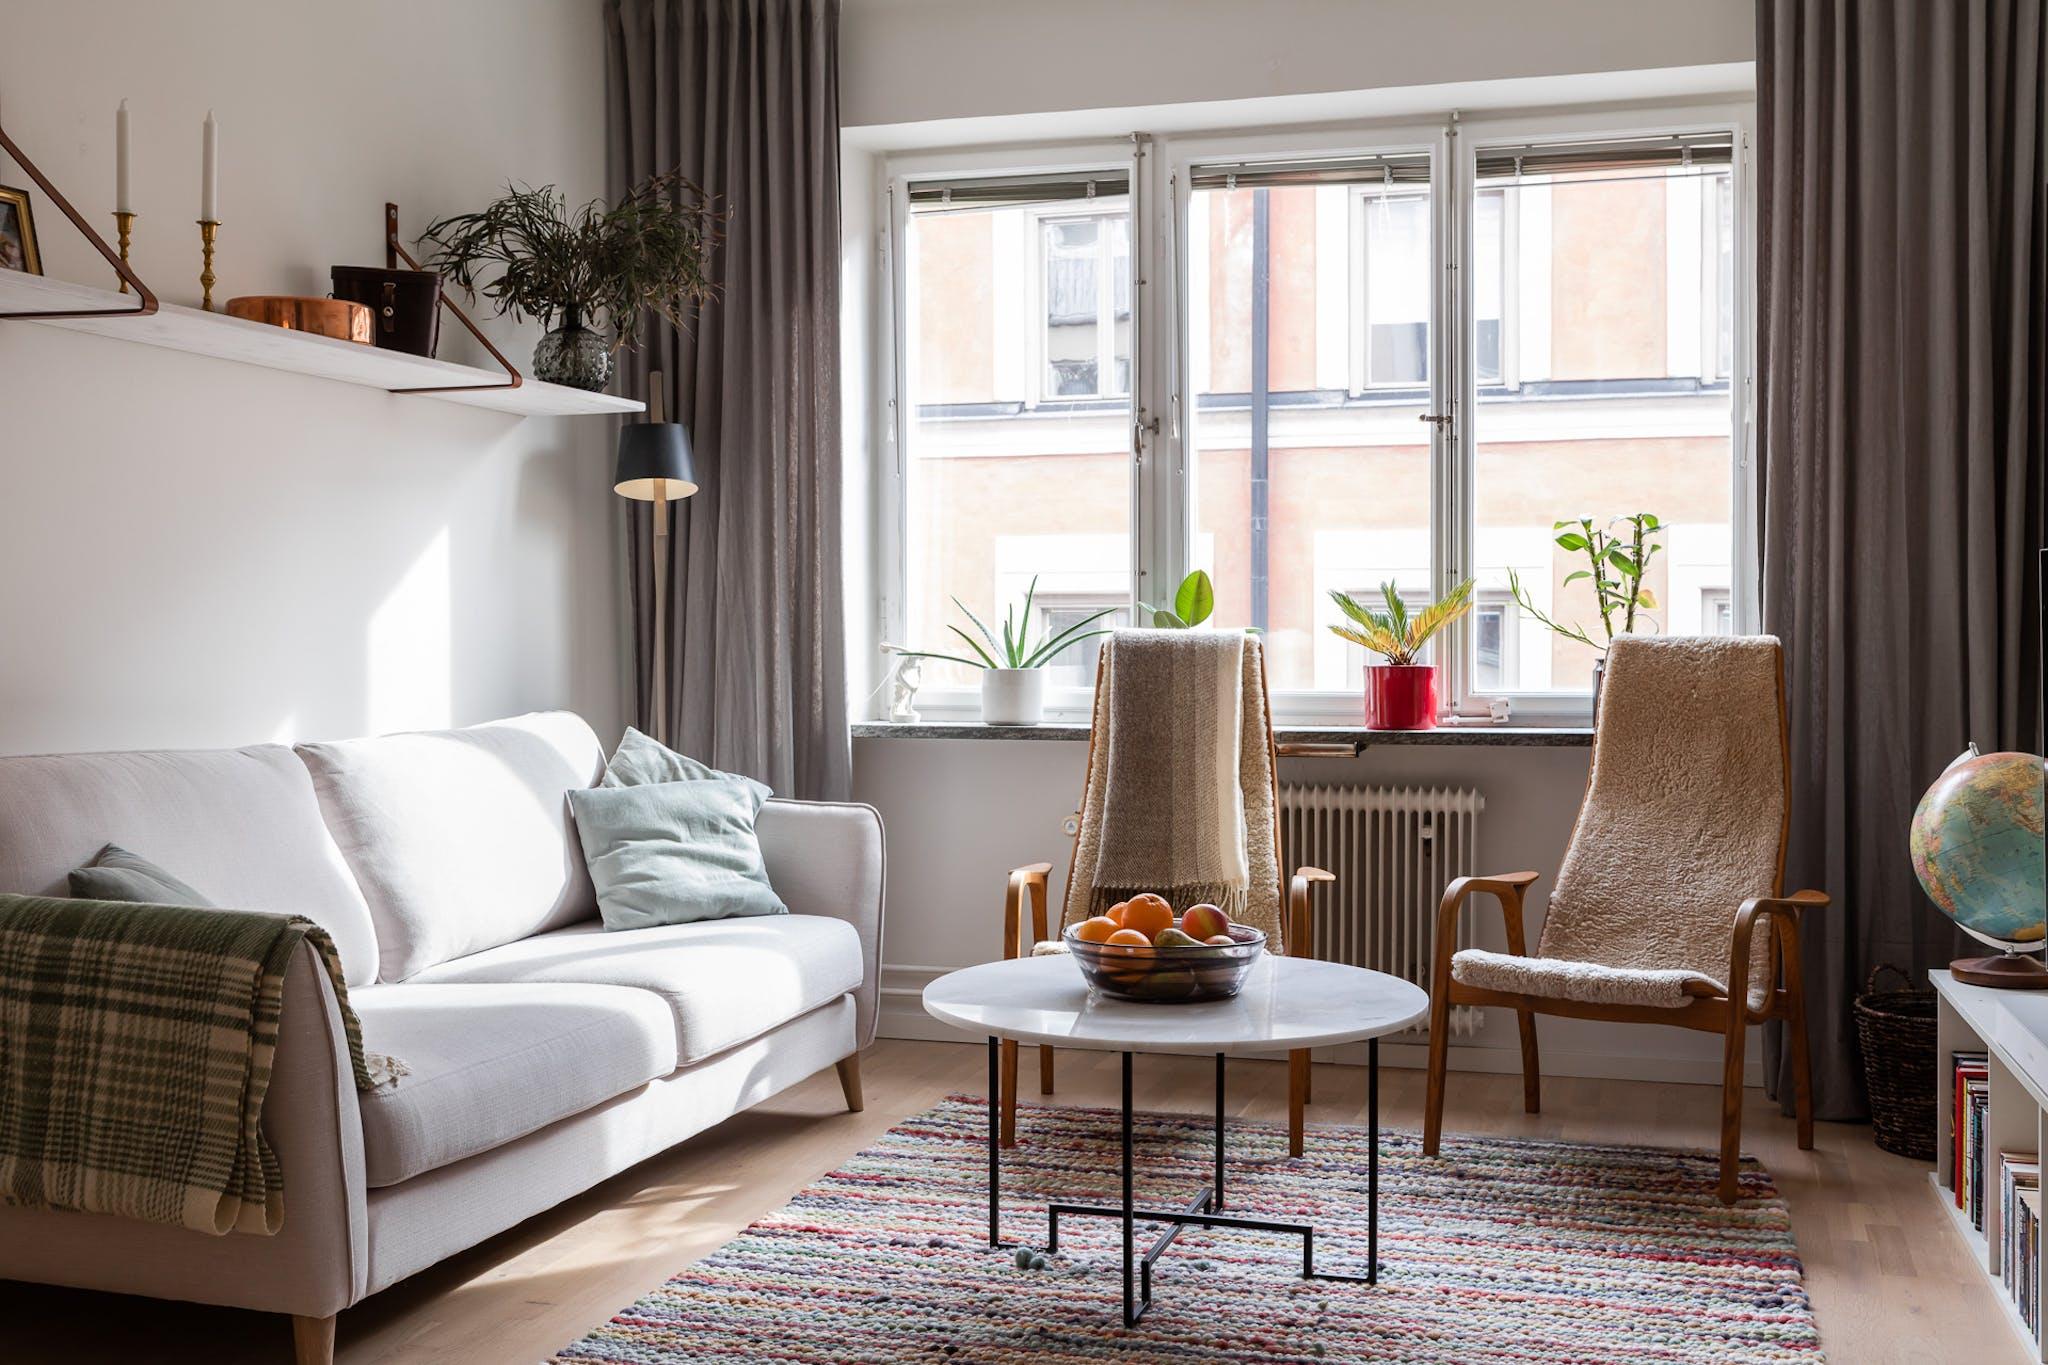 Holiday apartment Stockholm, Tavastgatan, Holiday apartment for rent